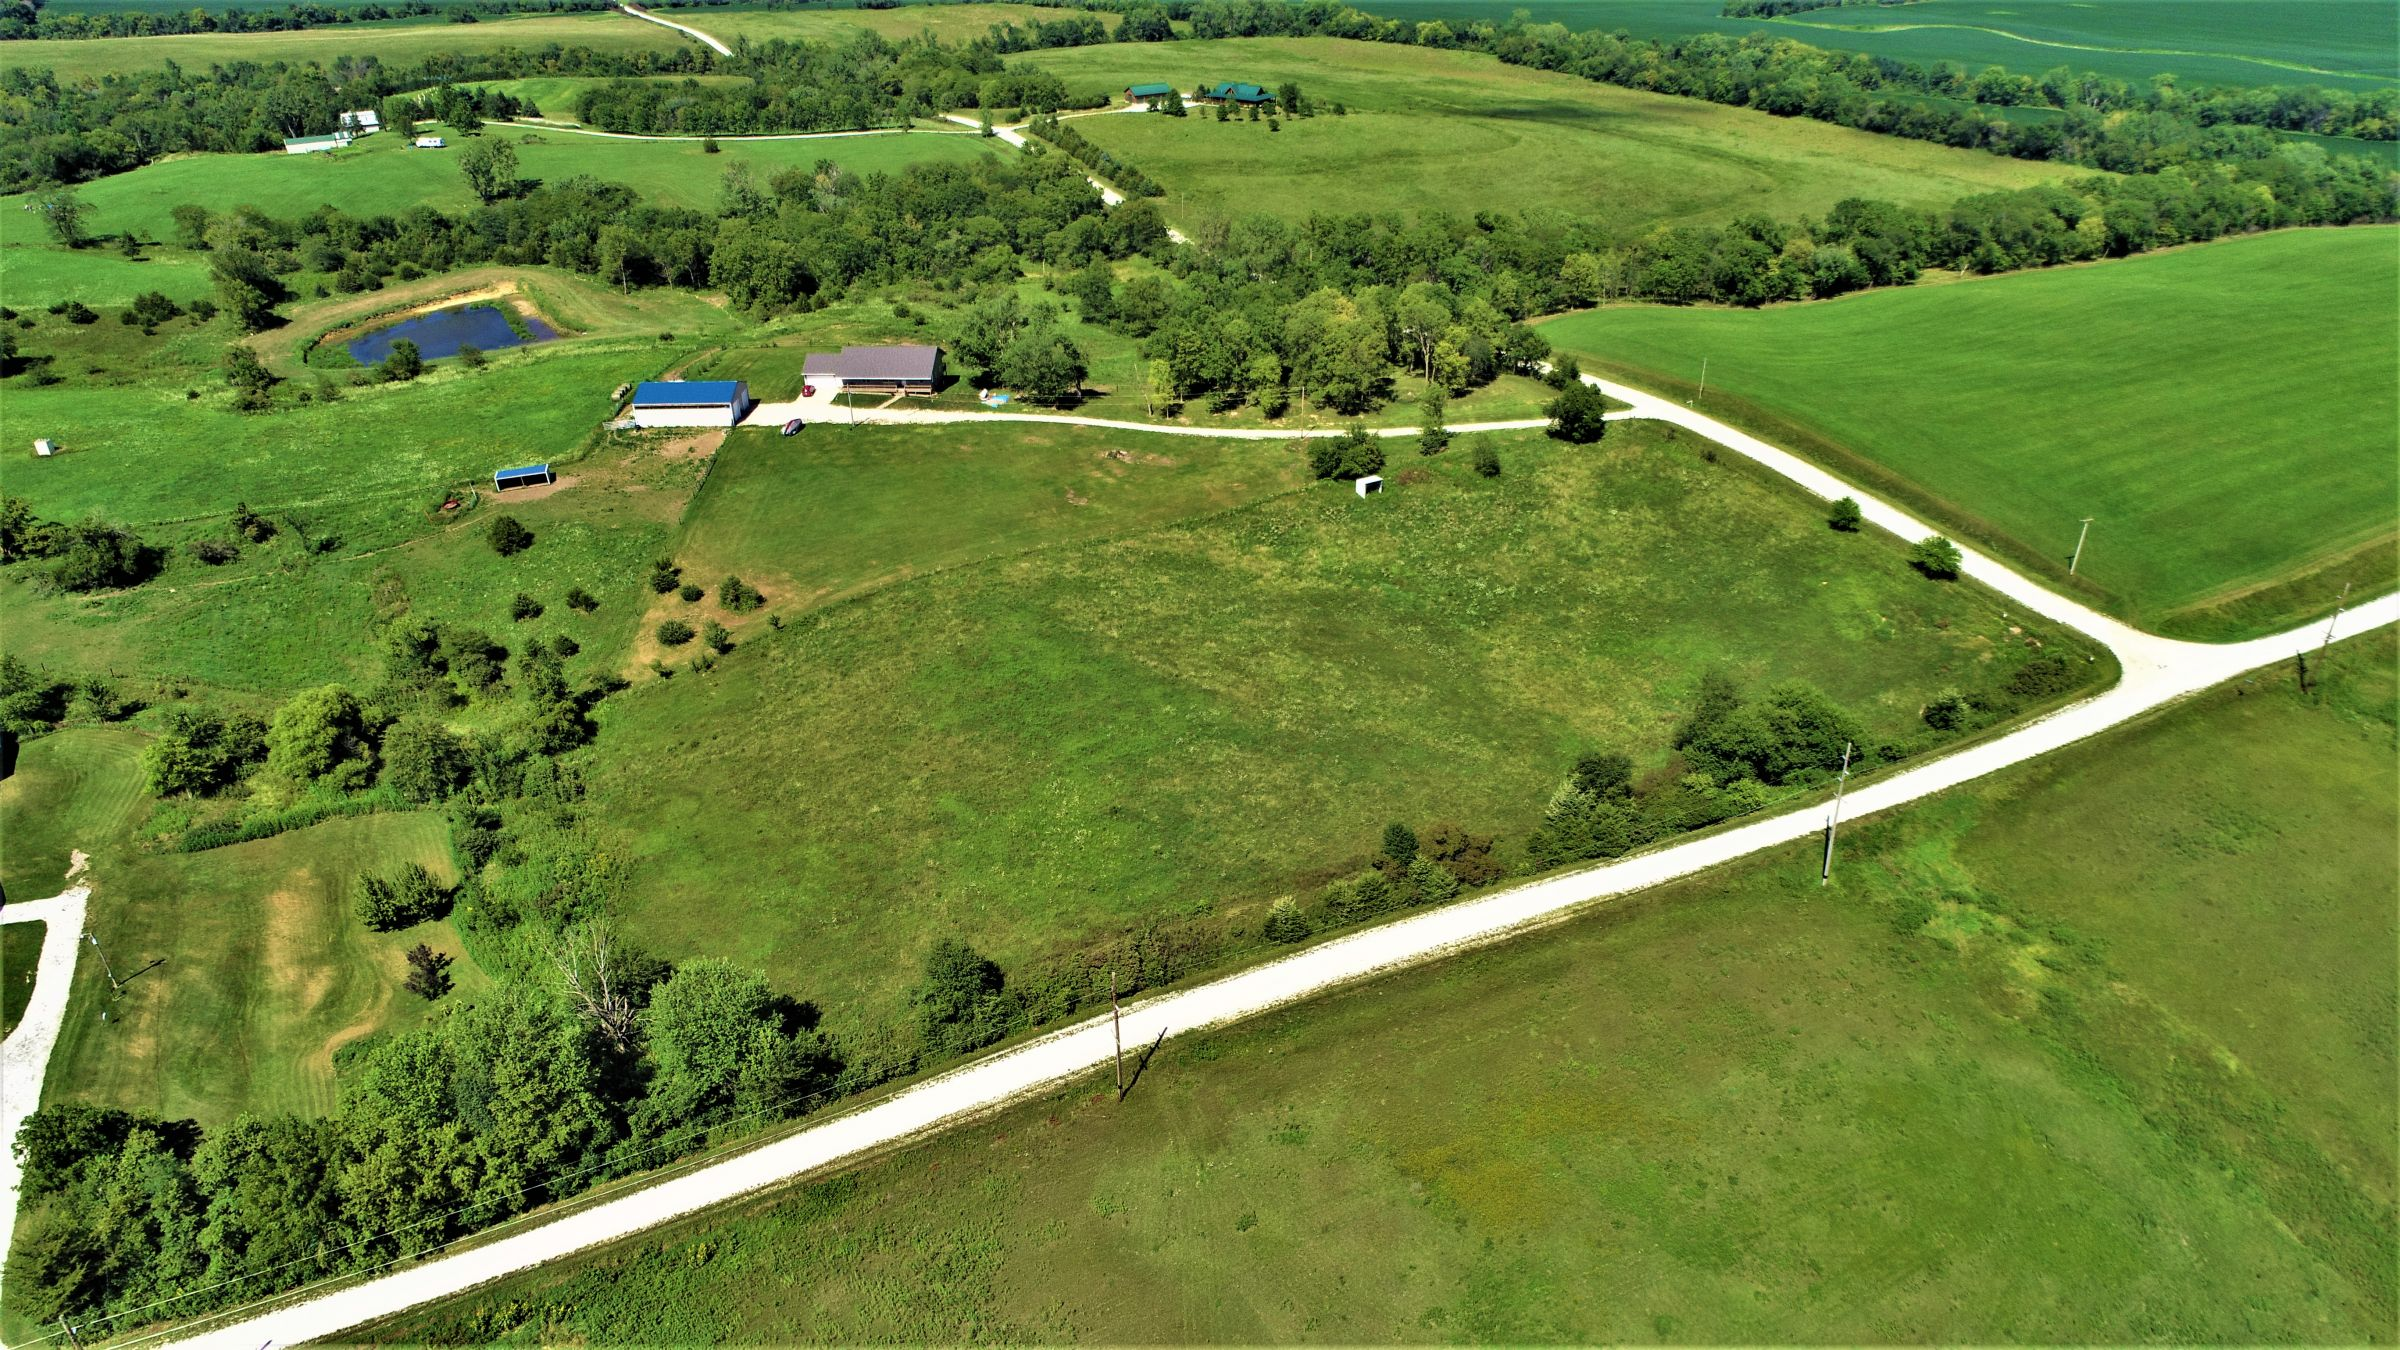 land-warren-county-iowa-6-acres-listing-number-15709-11-2021-08-27-202017.JPG